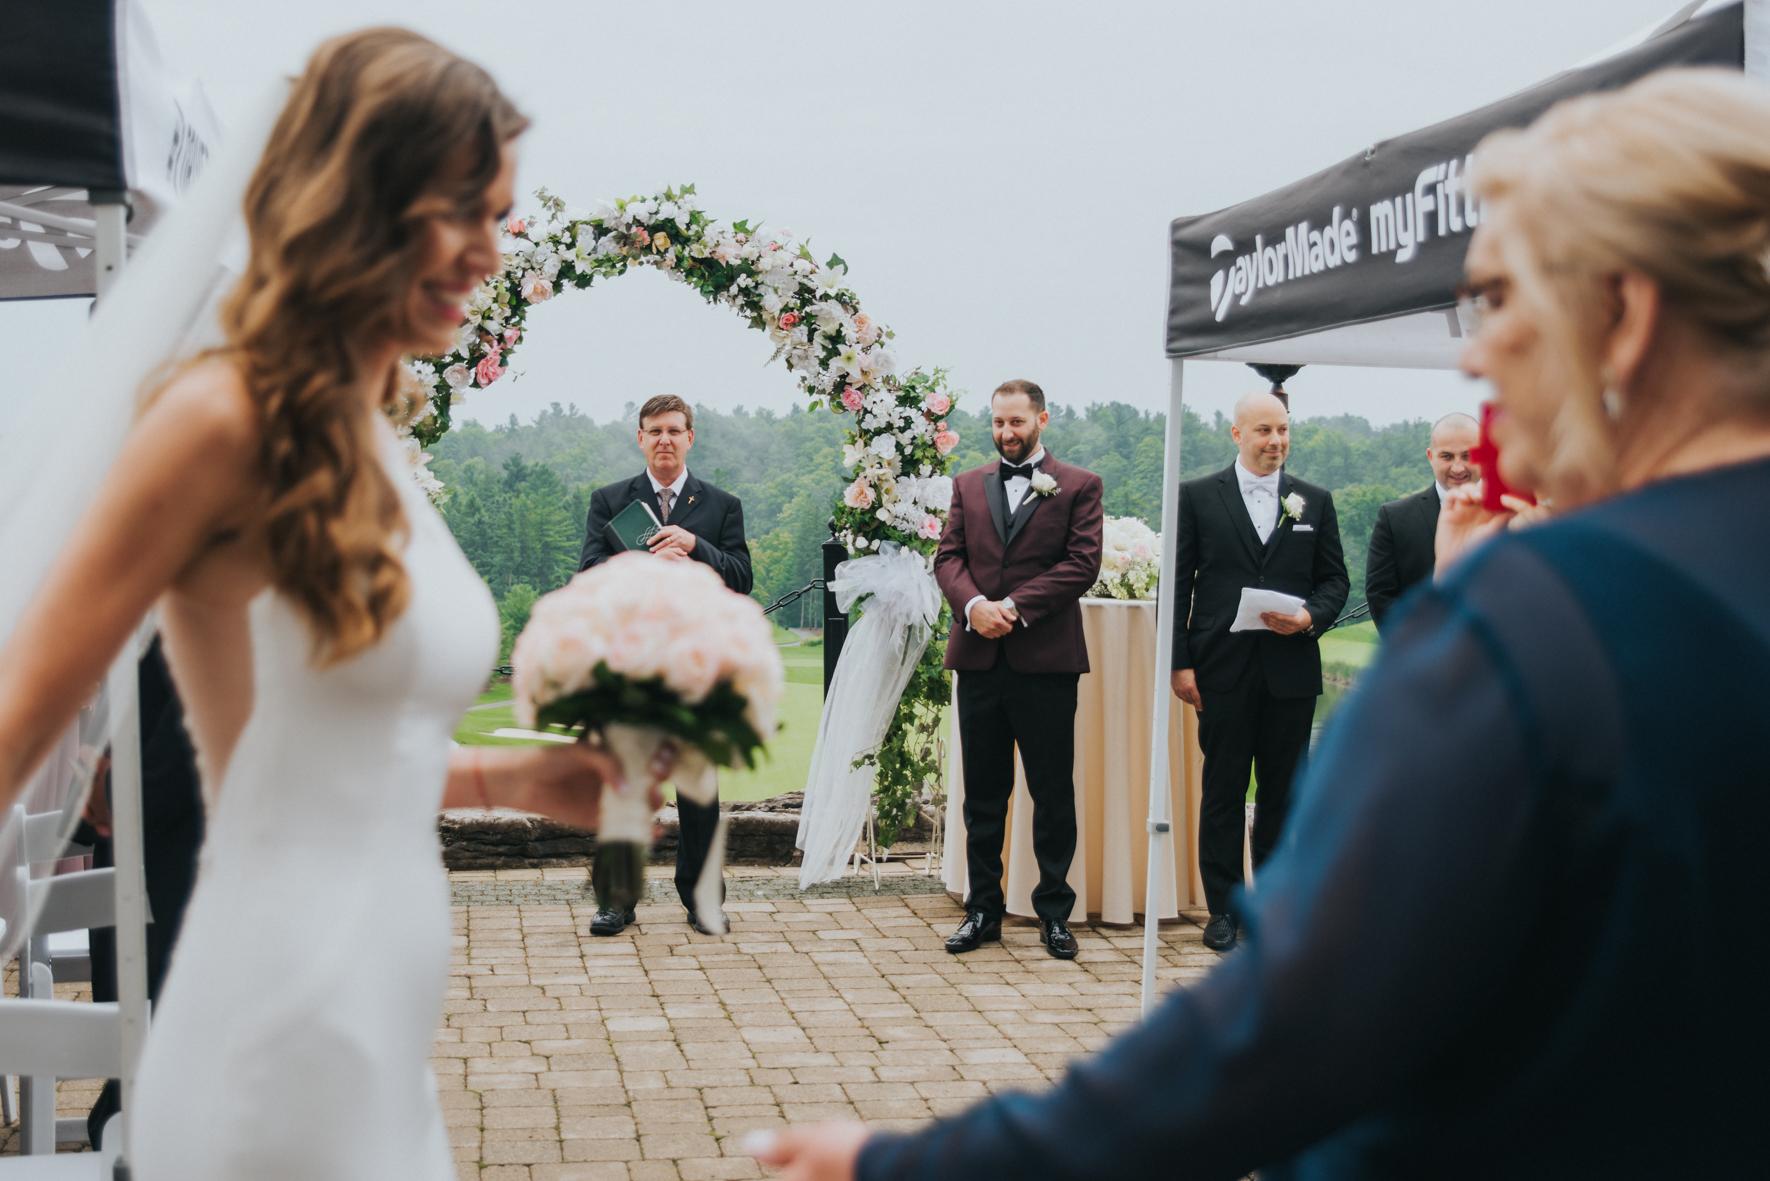 sandy-jana-copper-creek-golf-club-slovak-wedding-toronto-scandaleuse-photography-weddings-15.jpg